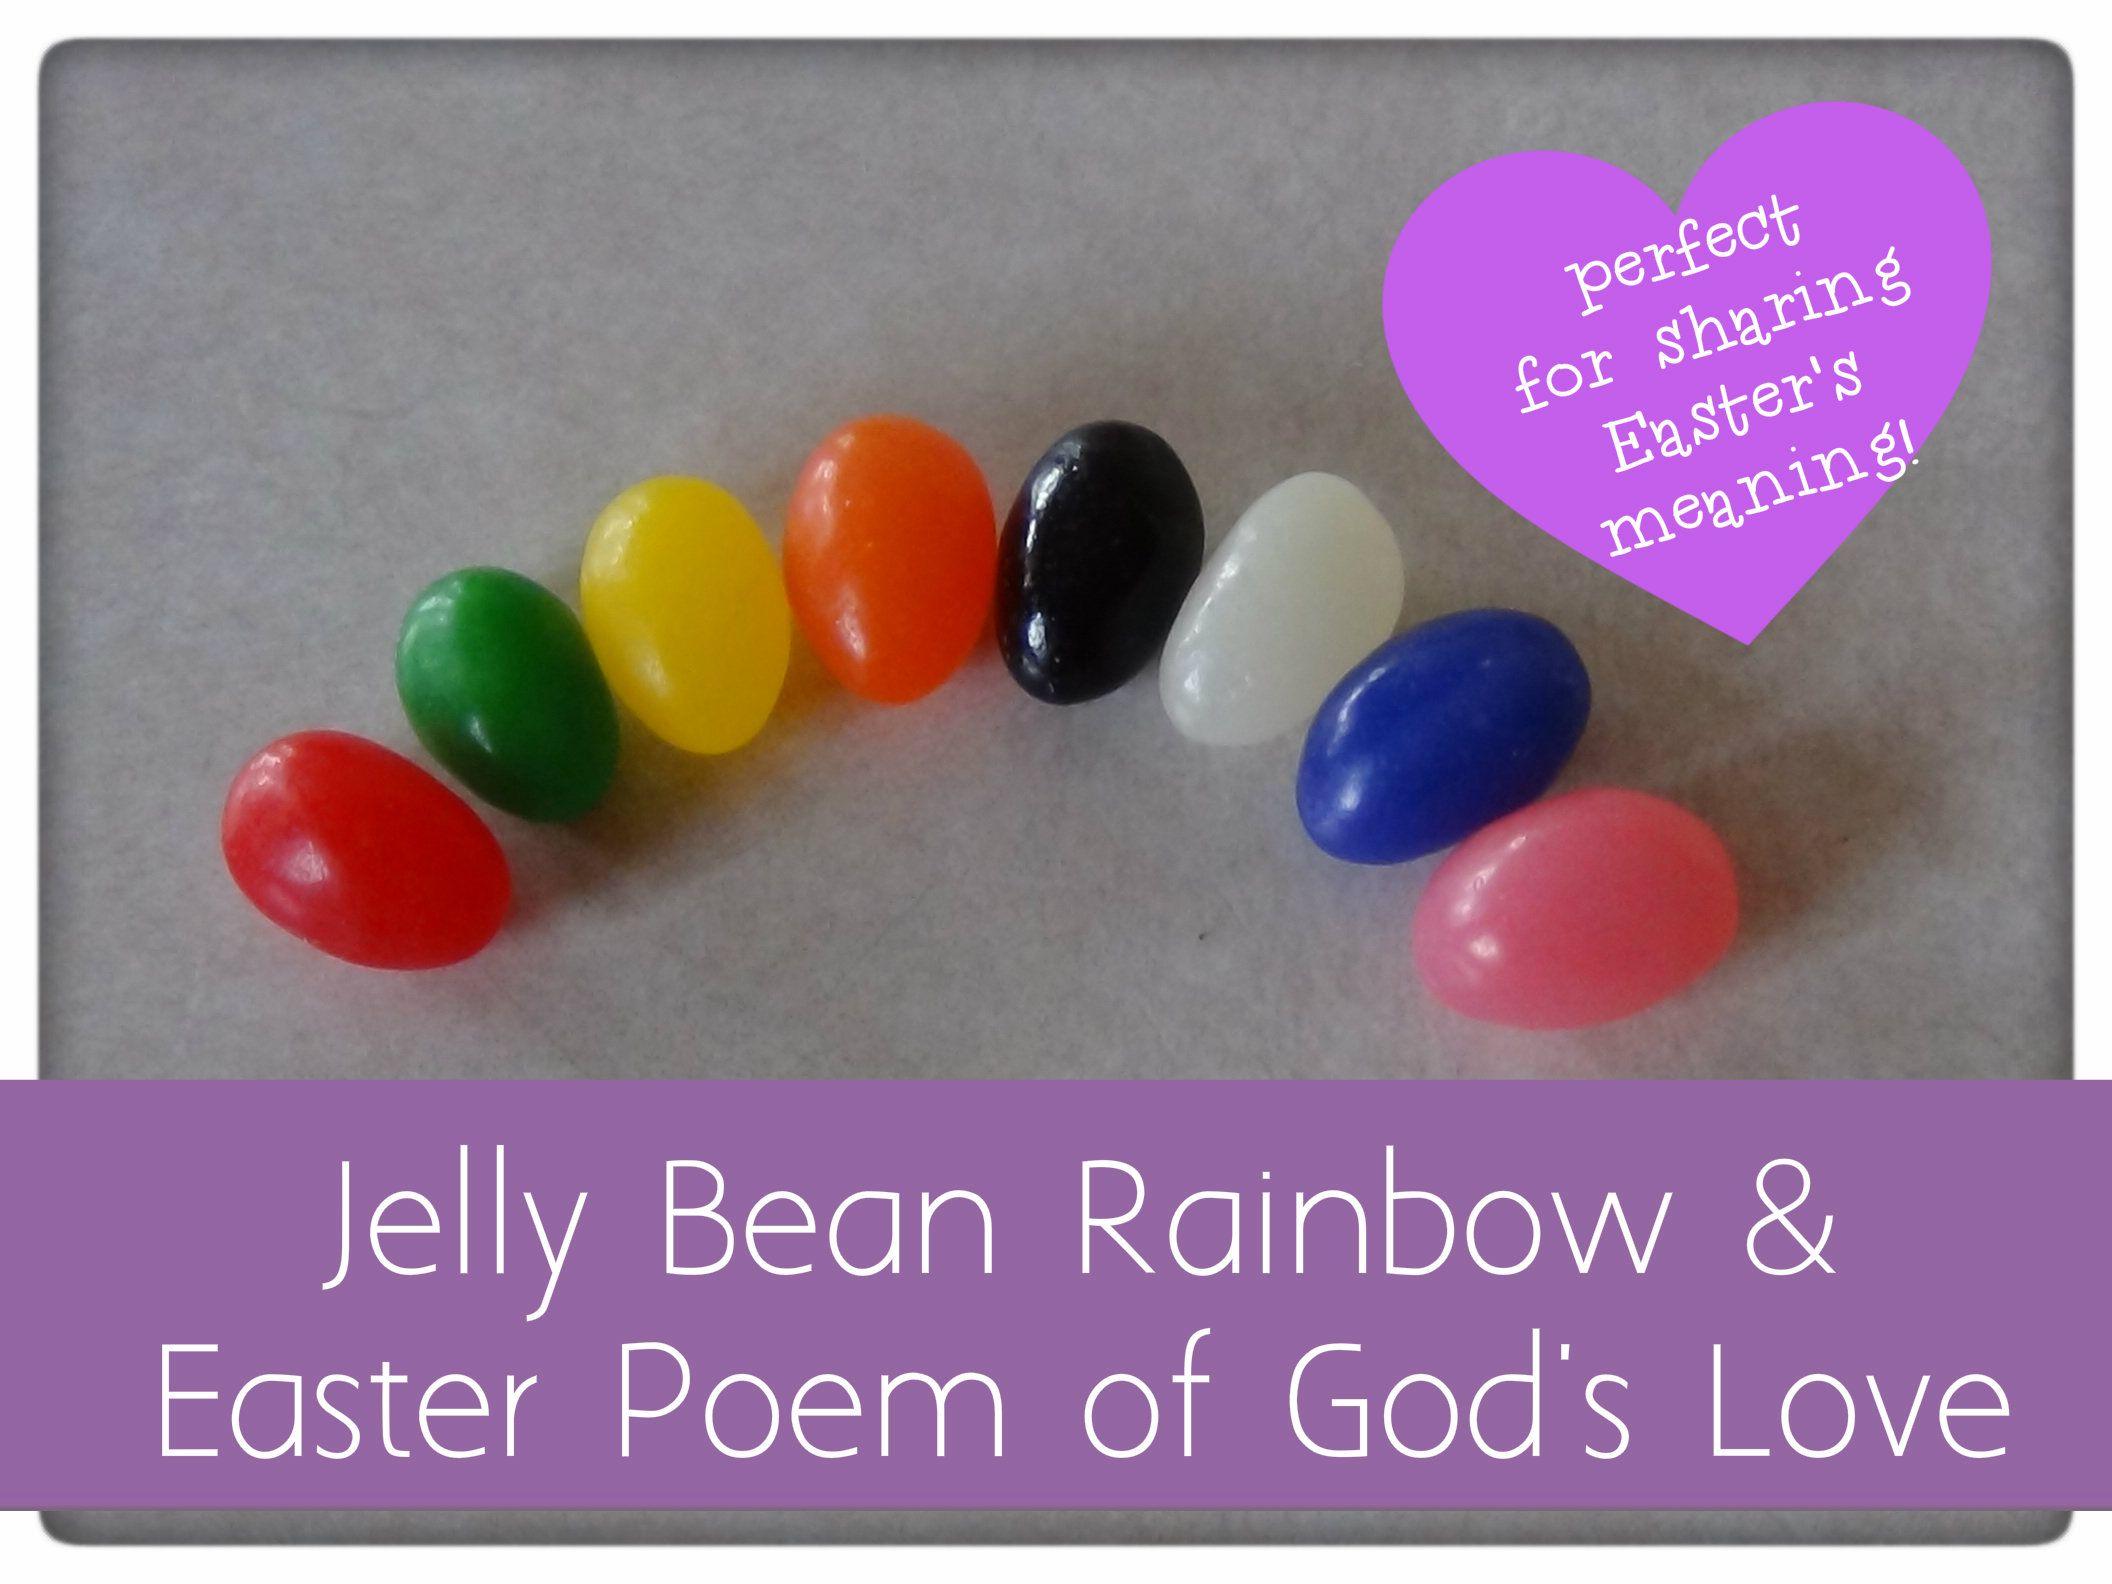 jellybeanpoem